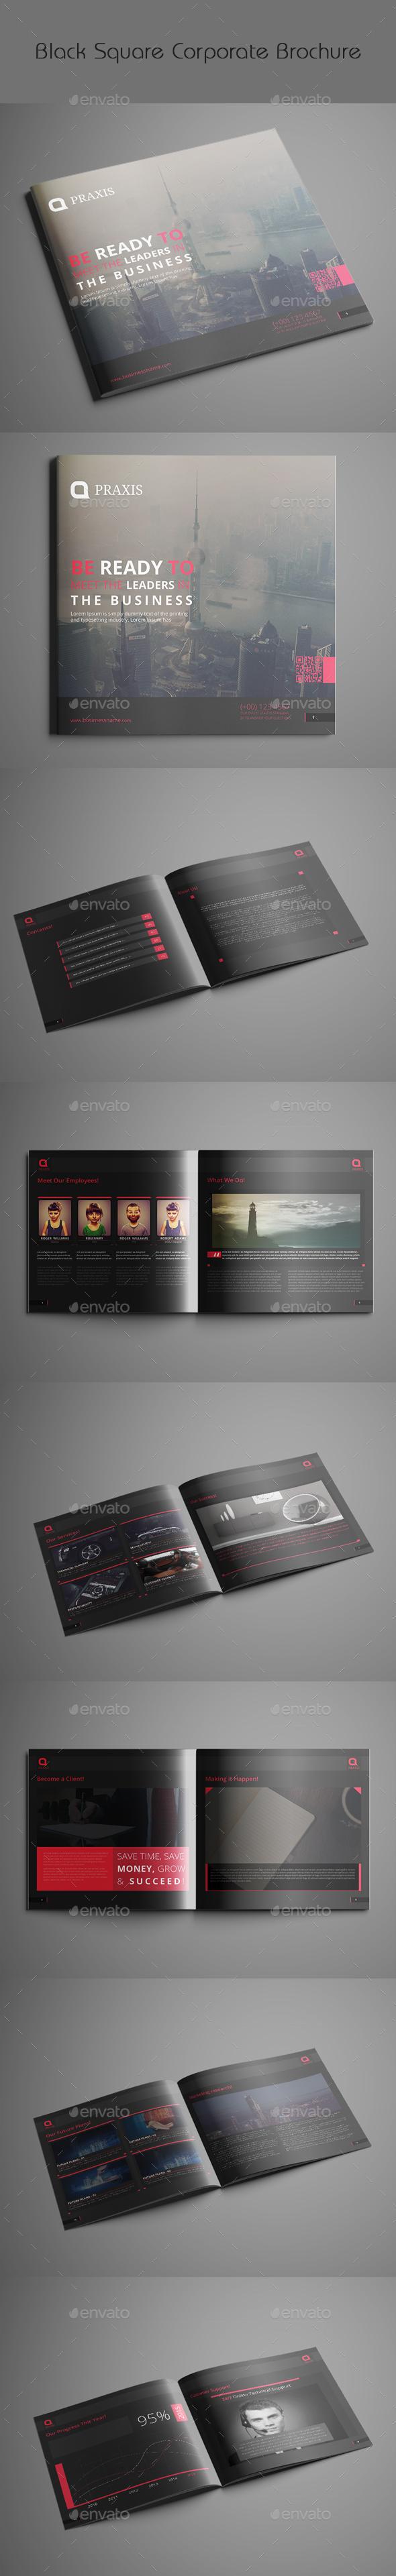 Black Square Corporate Brochure - Brochures Print Templates